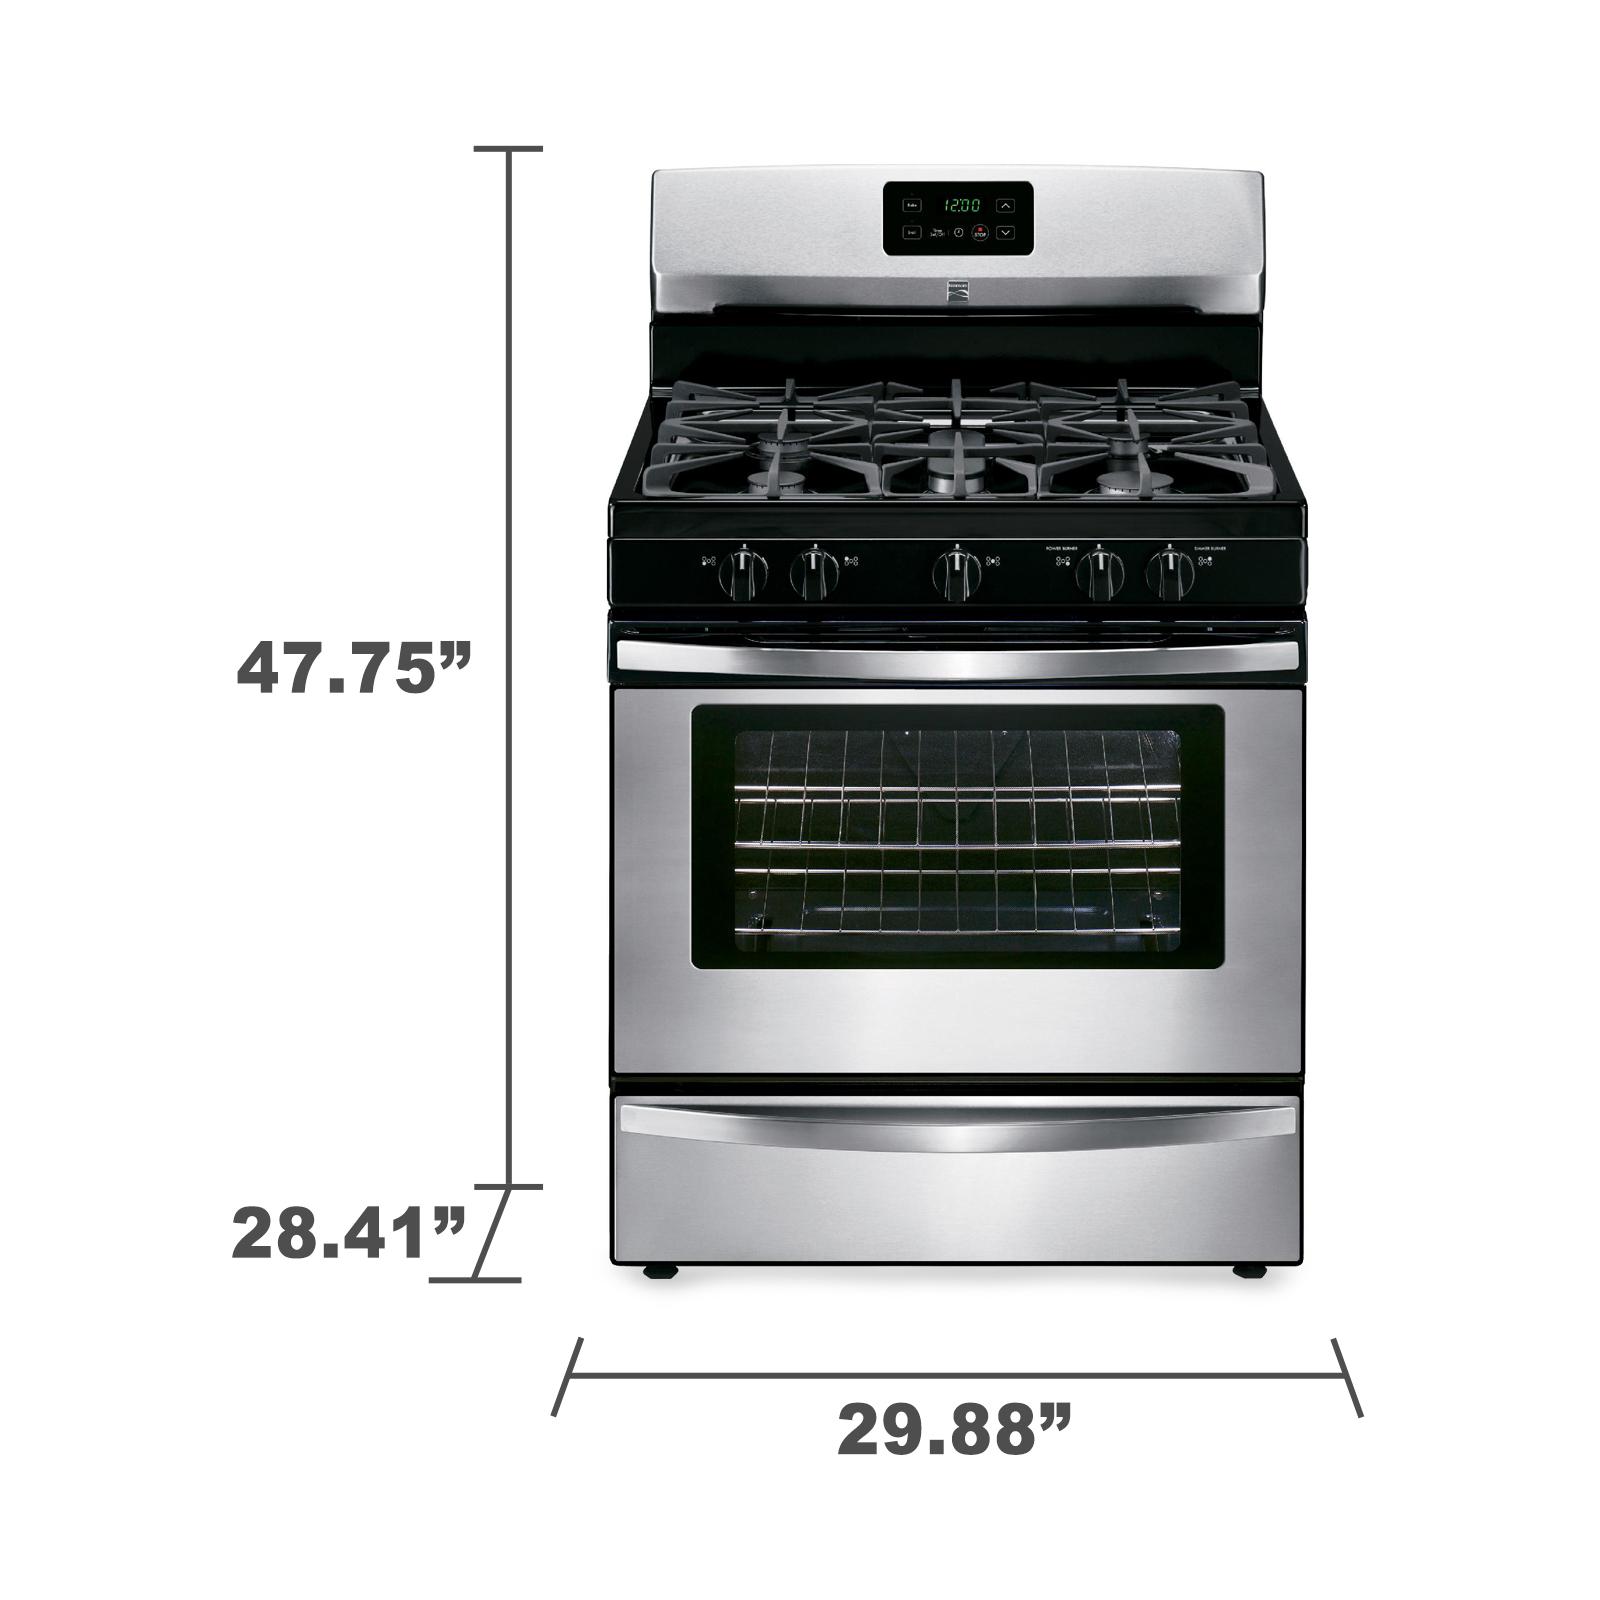 hotpoint gas stove wiring diagram lance camper schematic ge oven parts list elsavadorla